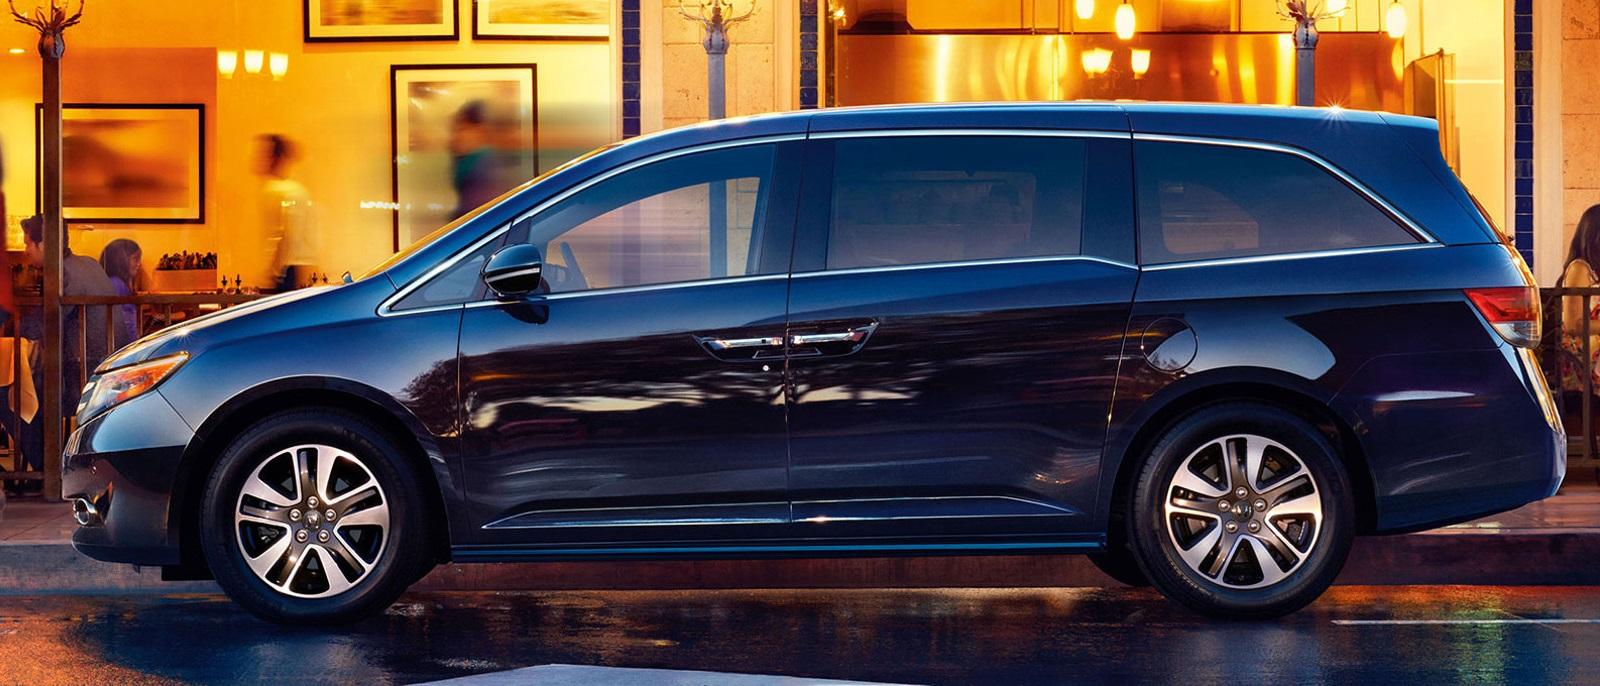 Honda odyssey compare 2014 autos post for 2015 honda odyssey oil type